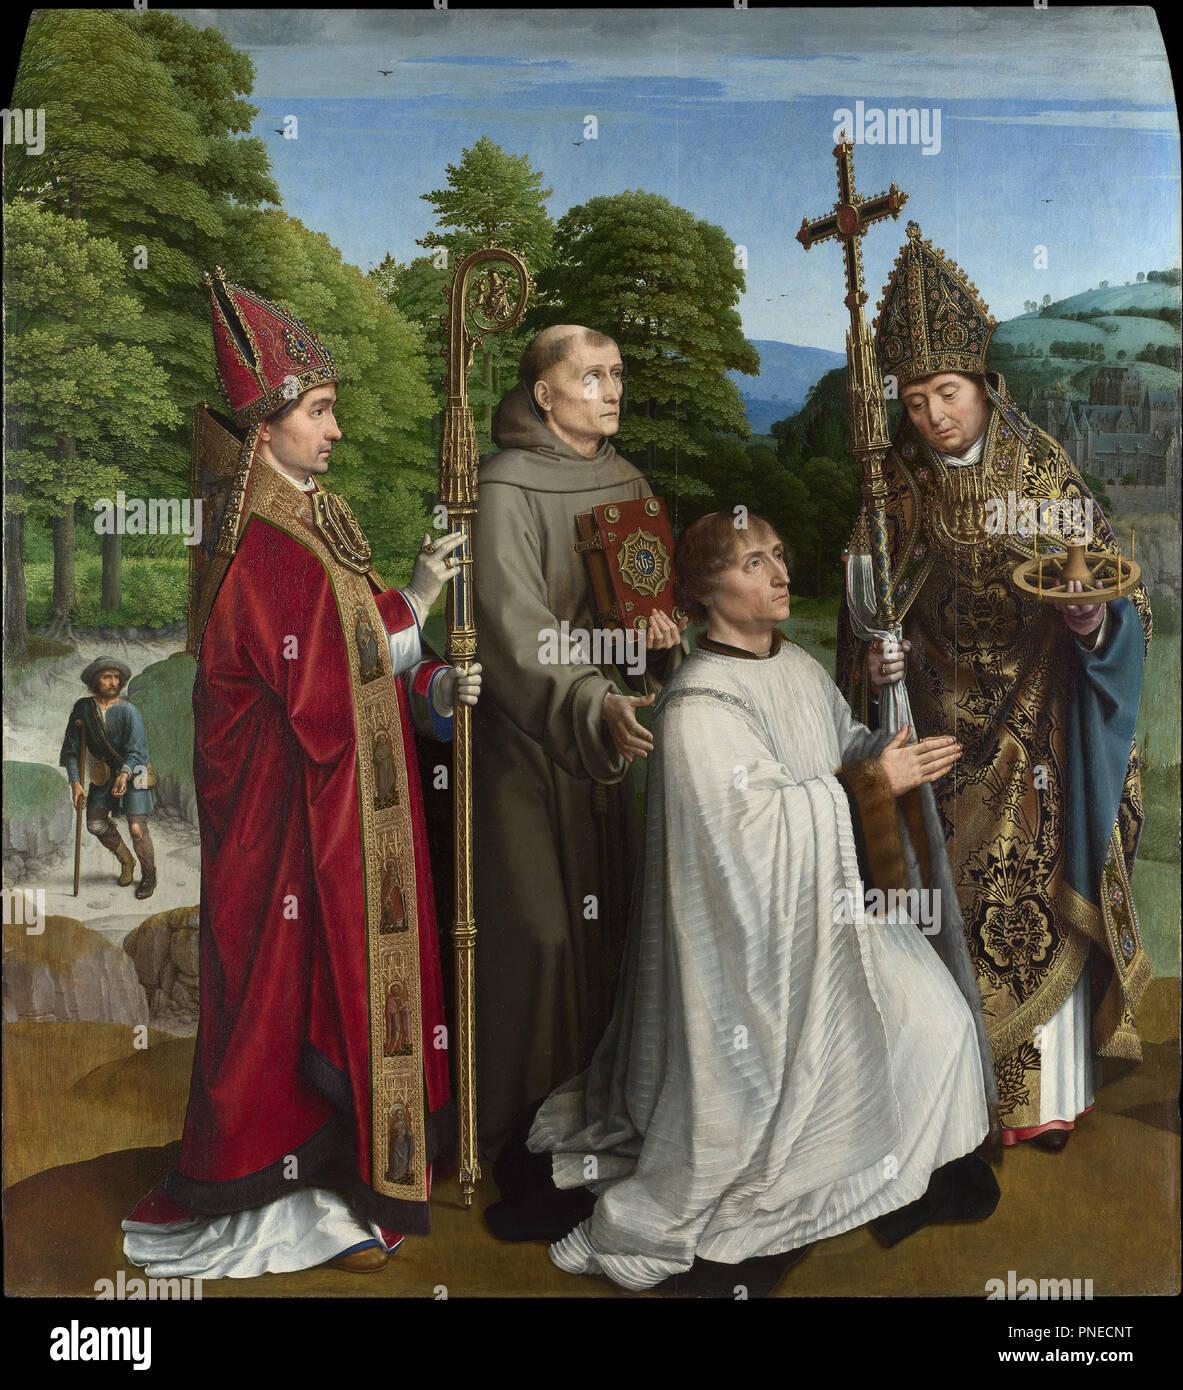 Canon Bernardijn Salviati and Three Saints. Painting. Oil on panel. Height: 103.4 cm (40.7 in); Width: 94.3 cm (37.1 in). Author: Gerard David. - Stock Image